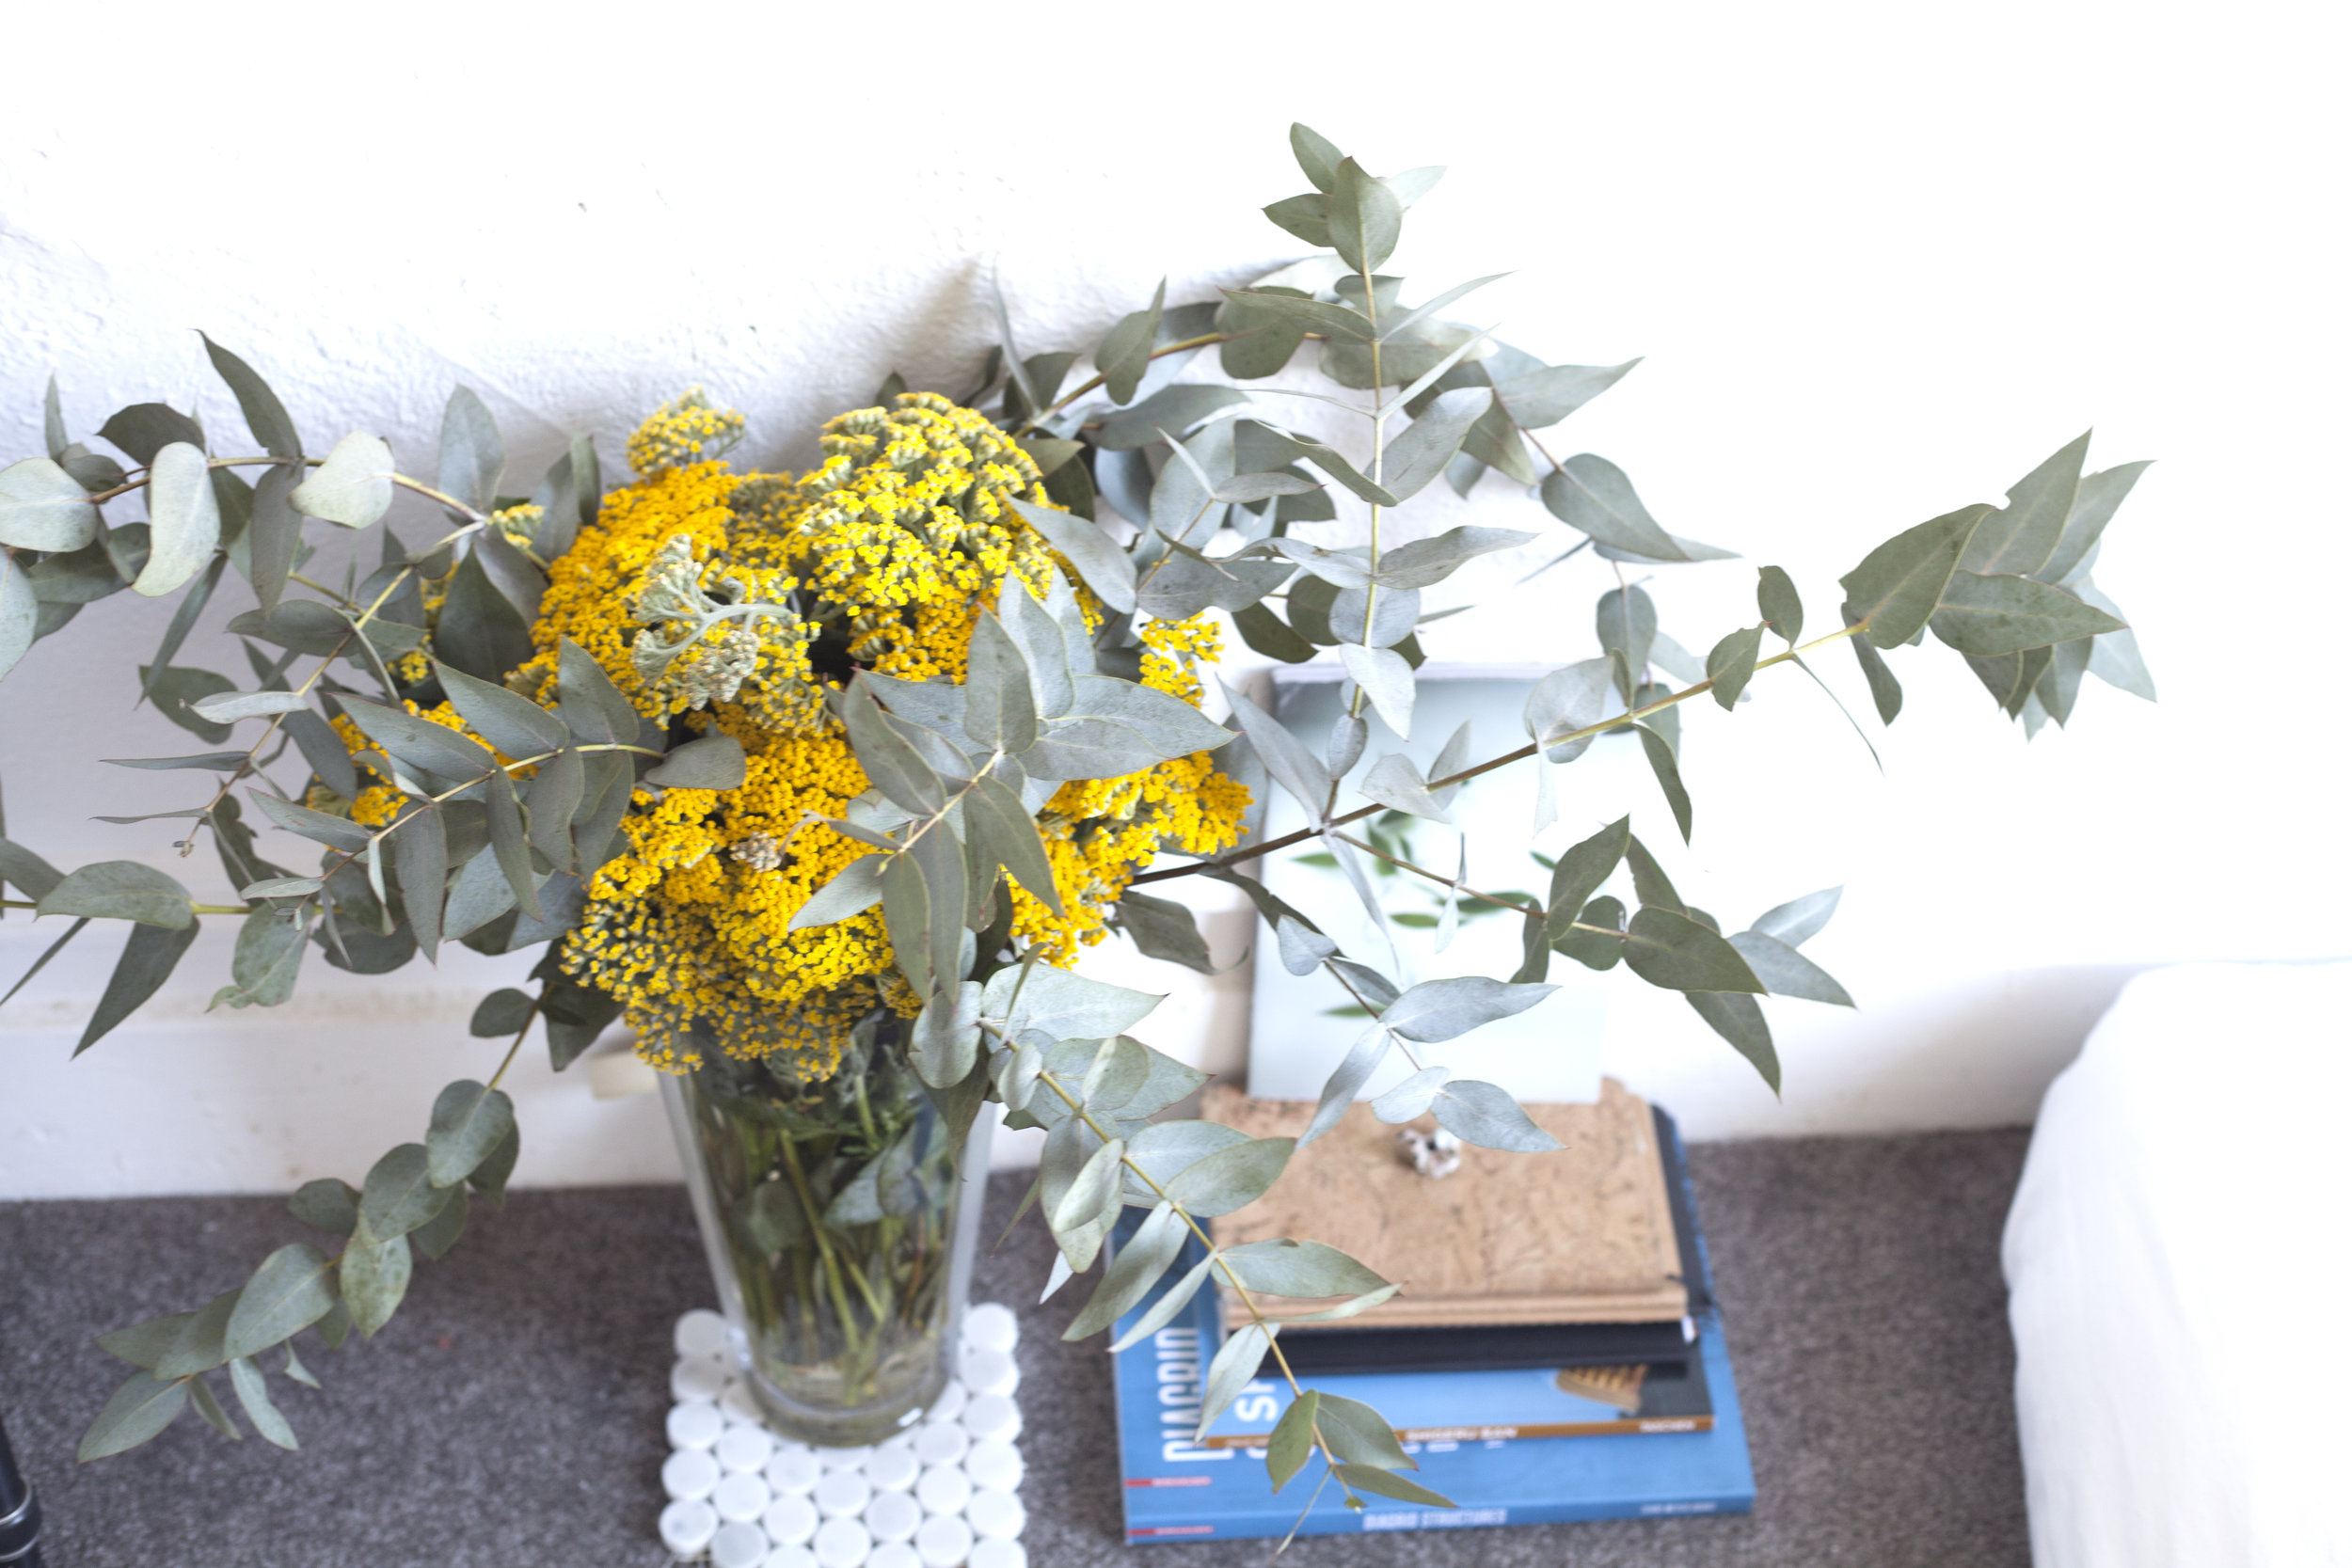 A bouquet of Eucalyptus and Yarrow